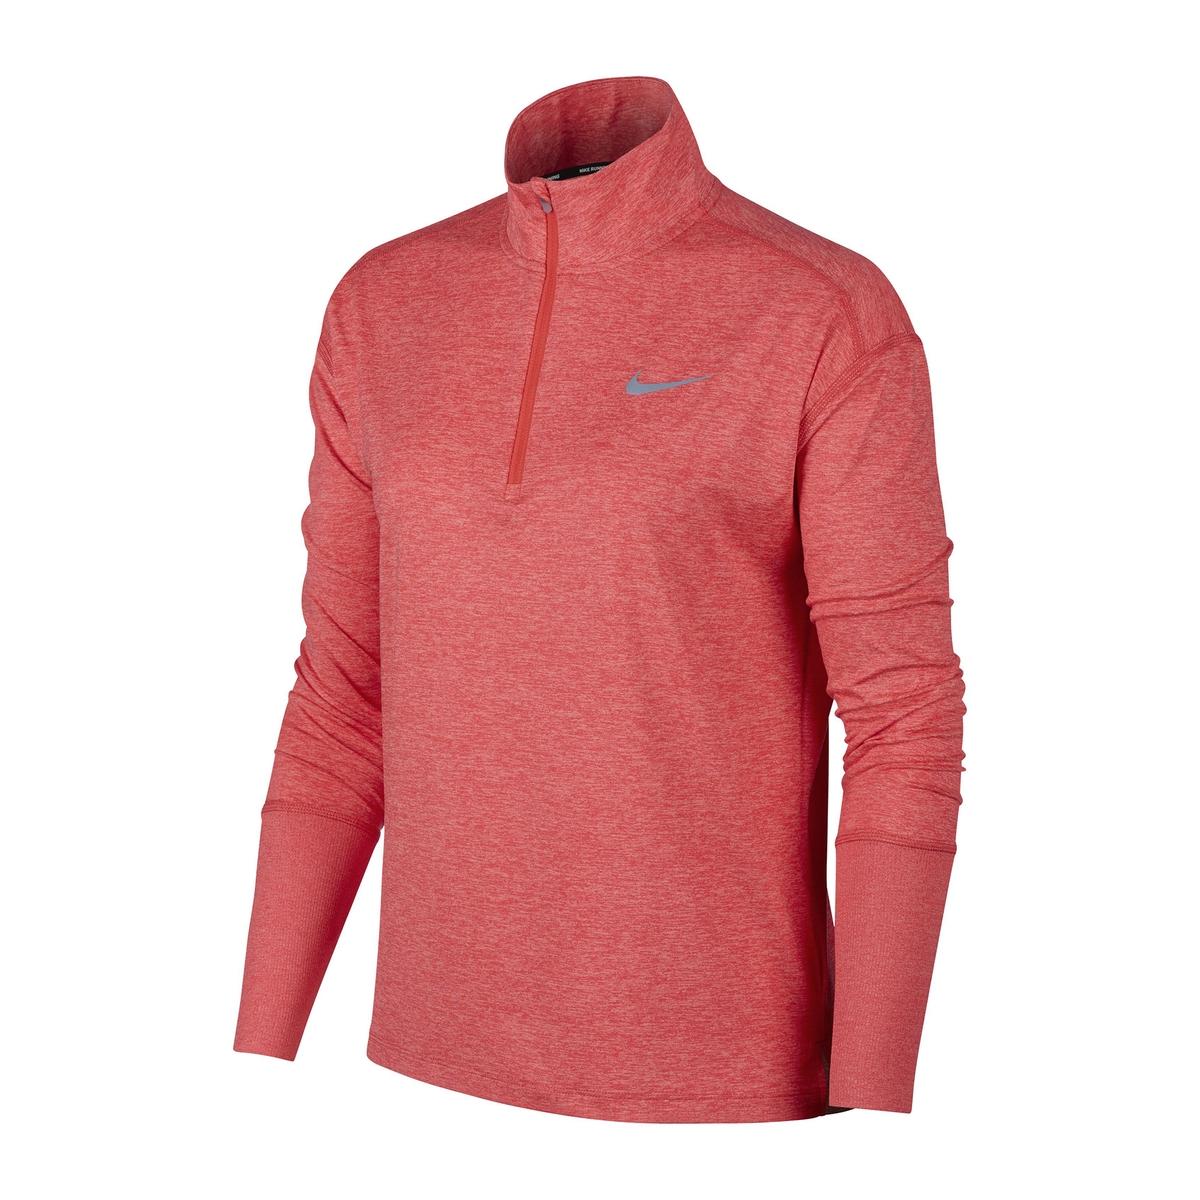 Imagen principal de producto de Camiseta de manga larga con cremallera - Nike